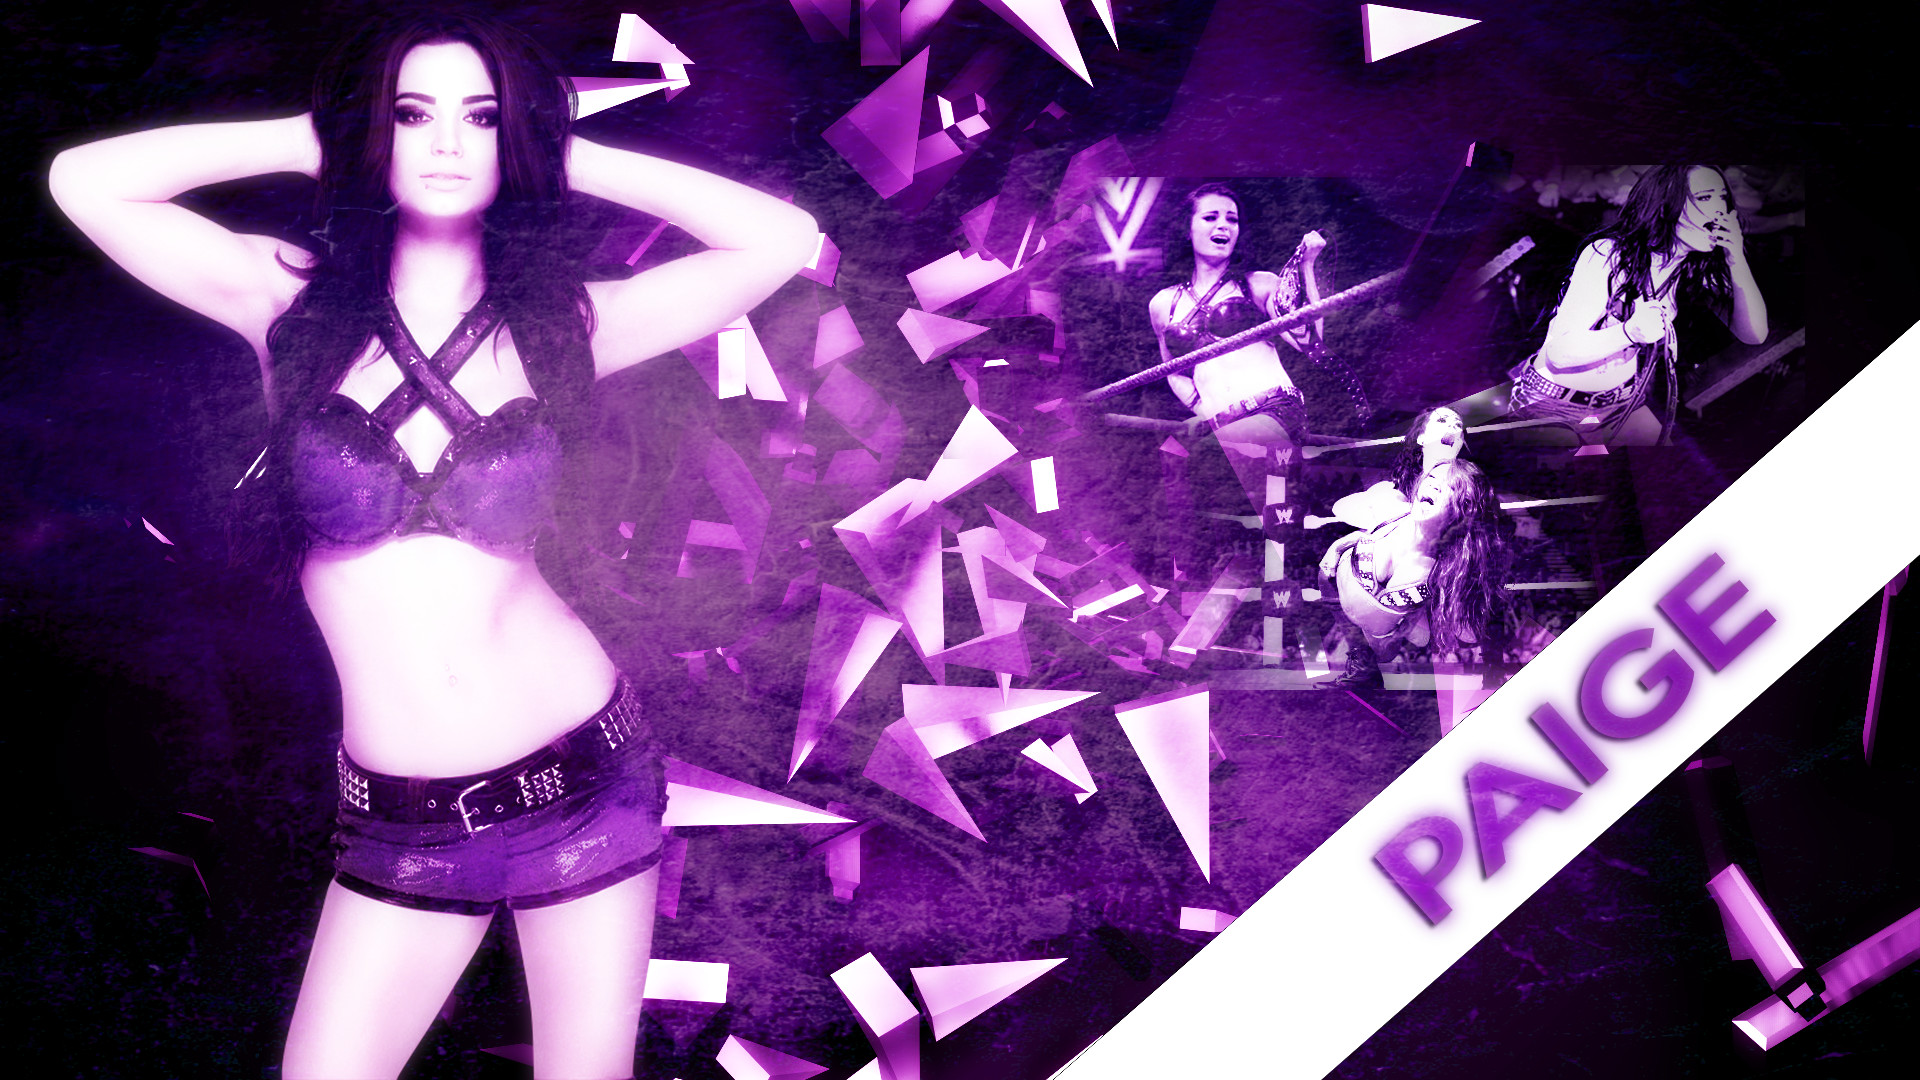 WWE – Divas Champion Paige – Custom Wallpaper by xpoisoneddivax on .